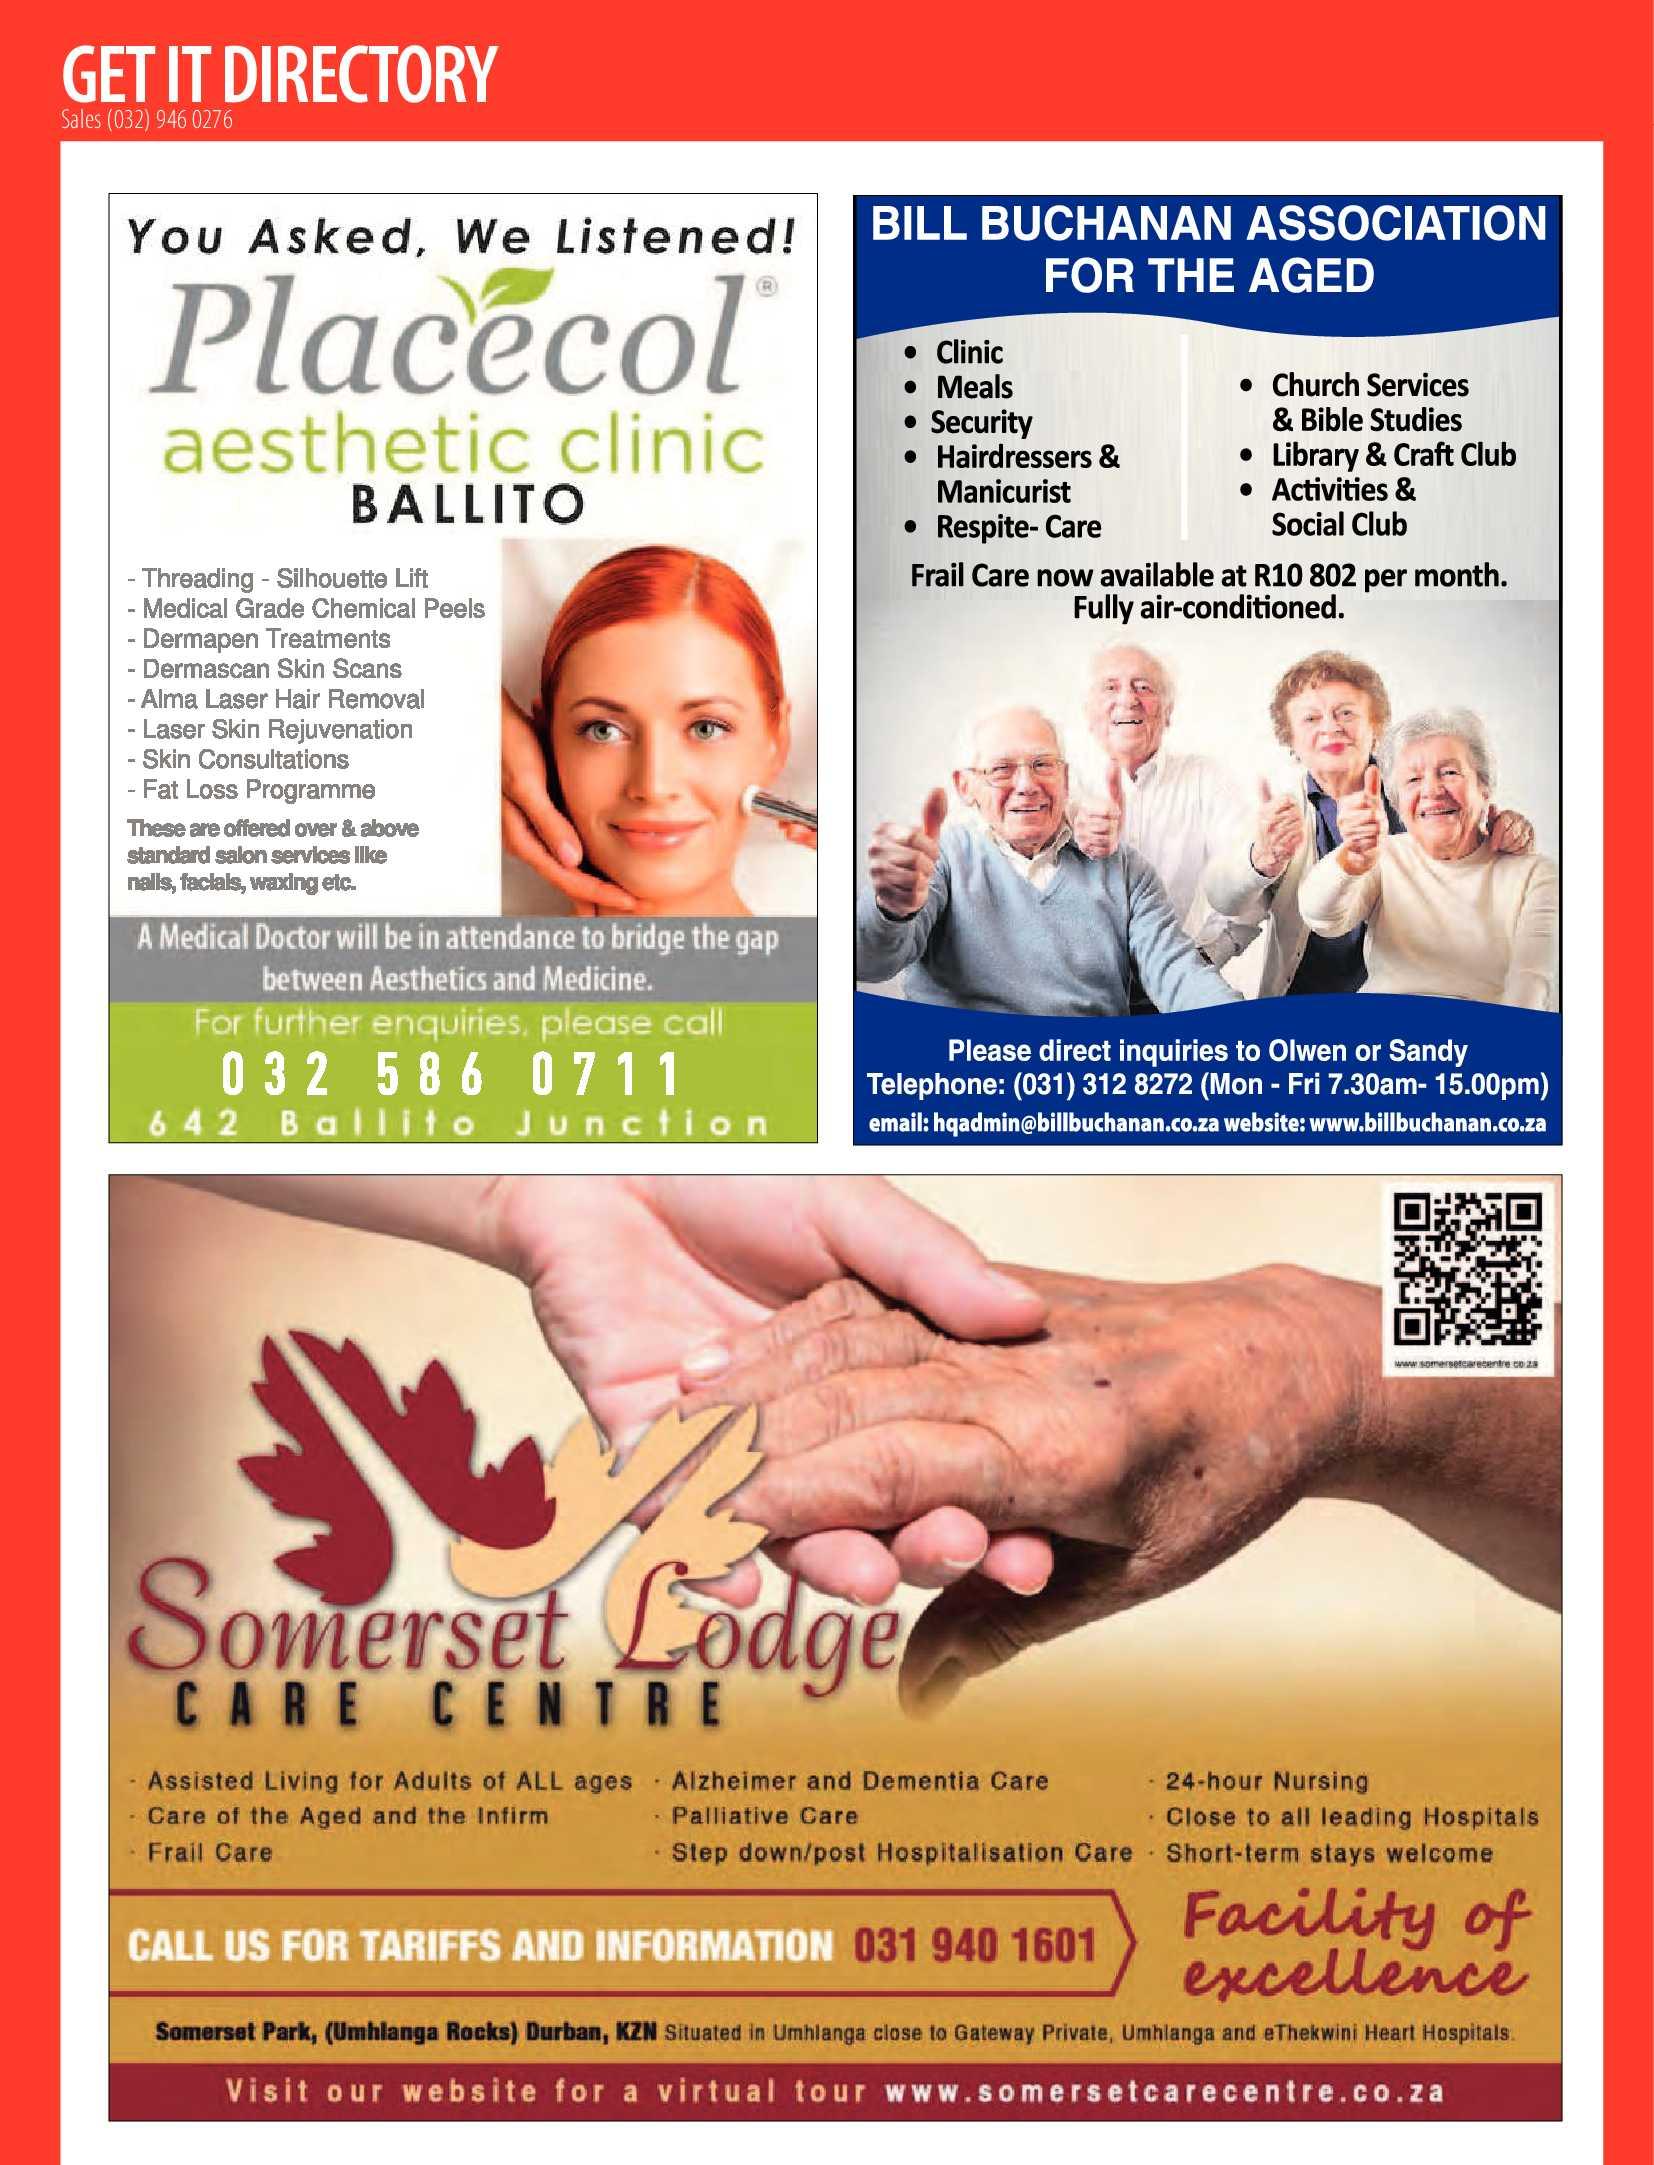 get-magazine-ballitoumhlanga-july-2017-2-epapers-page-60